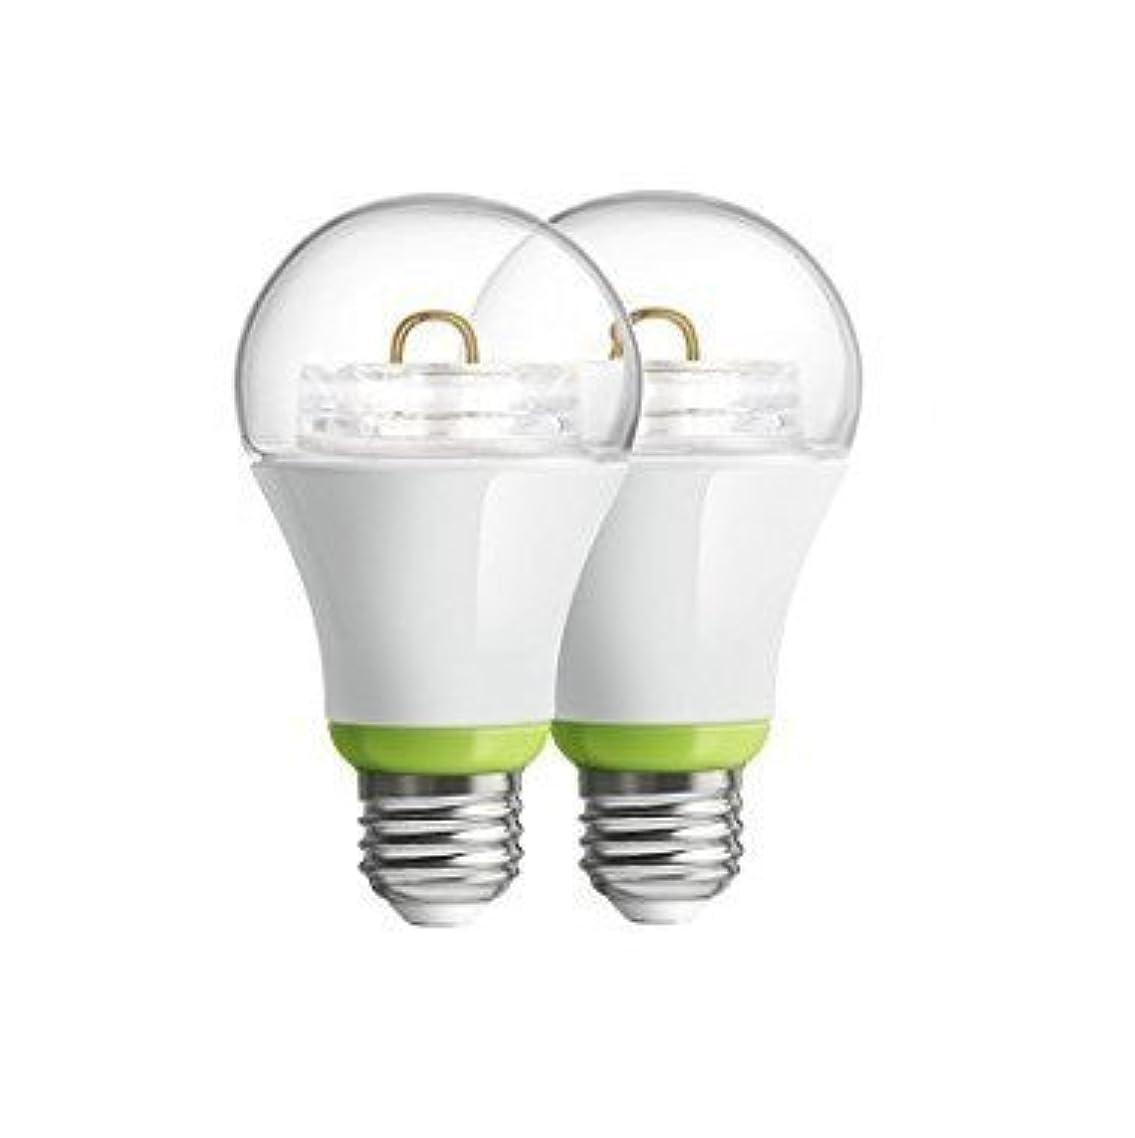 2-Pack GE Link Smart LED Light Bulb, A19 Soft White (2700K), 60-Watt Equivalent, Zigbee, Compatible with Alexa